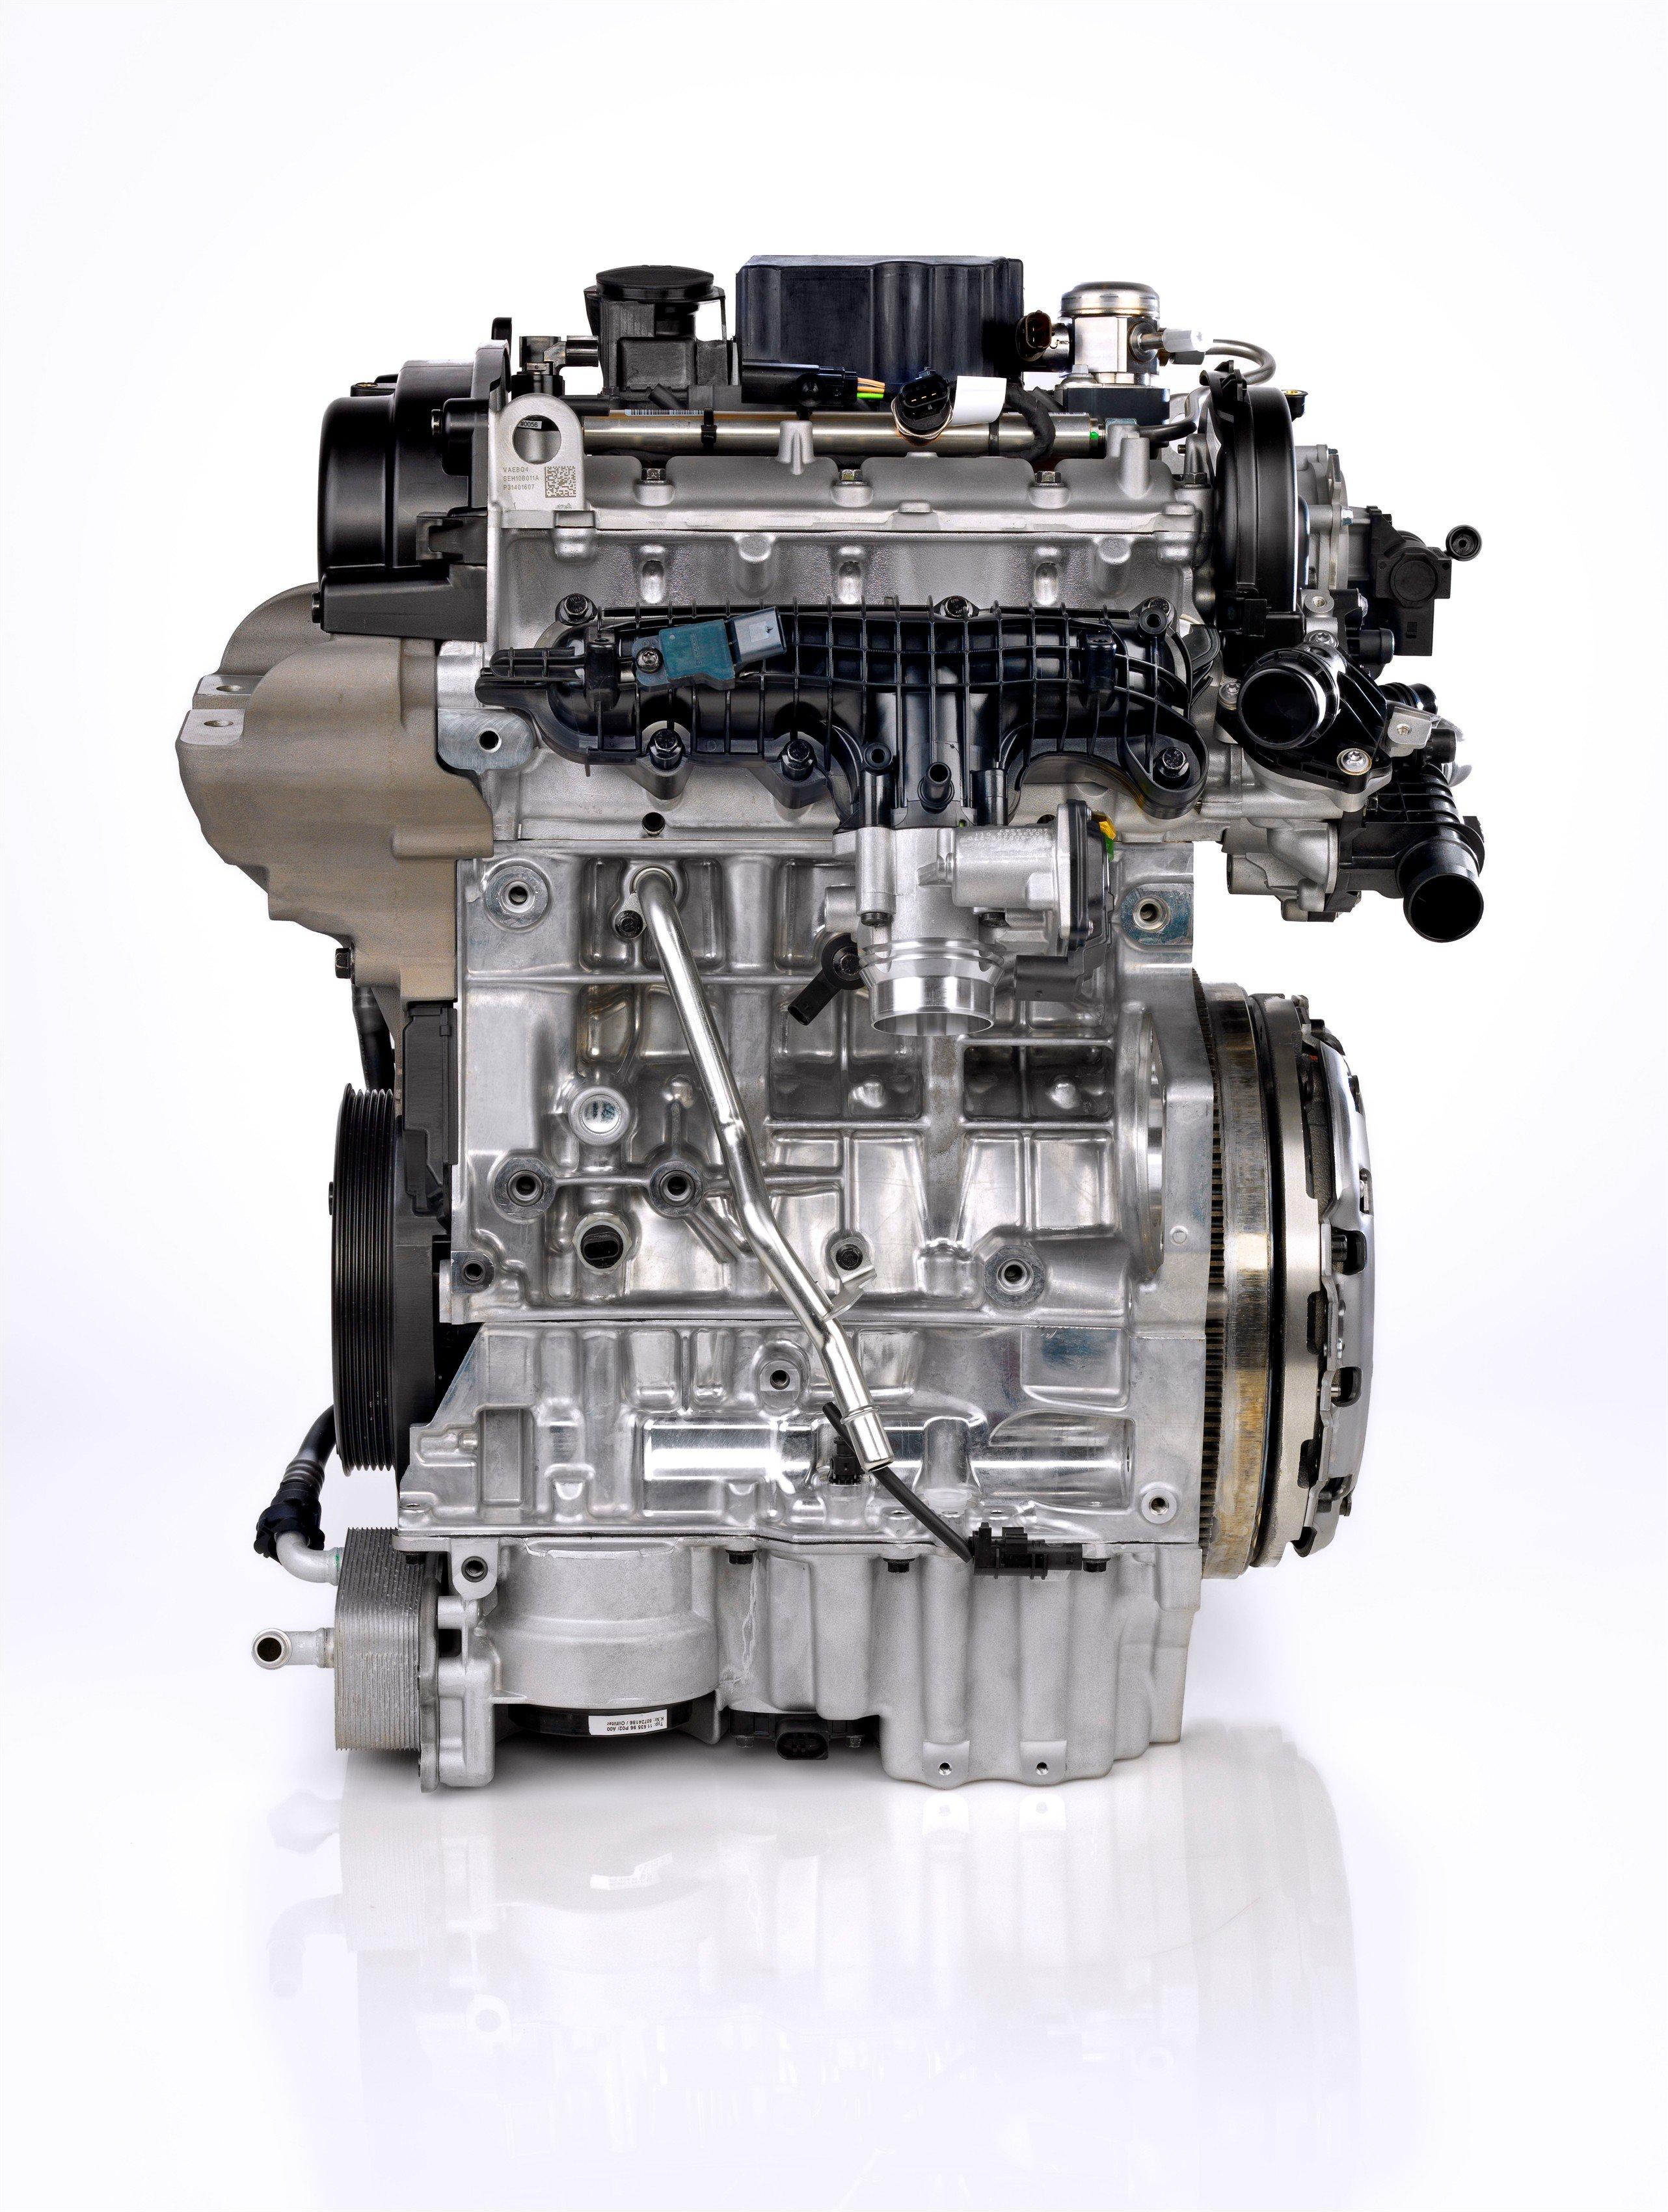 Volvo Developing New Three Cylinder Turbo Engine Image 295927